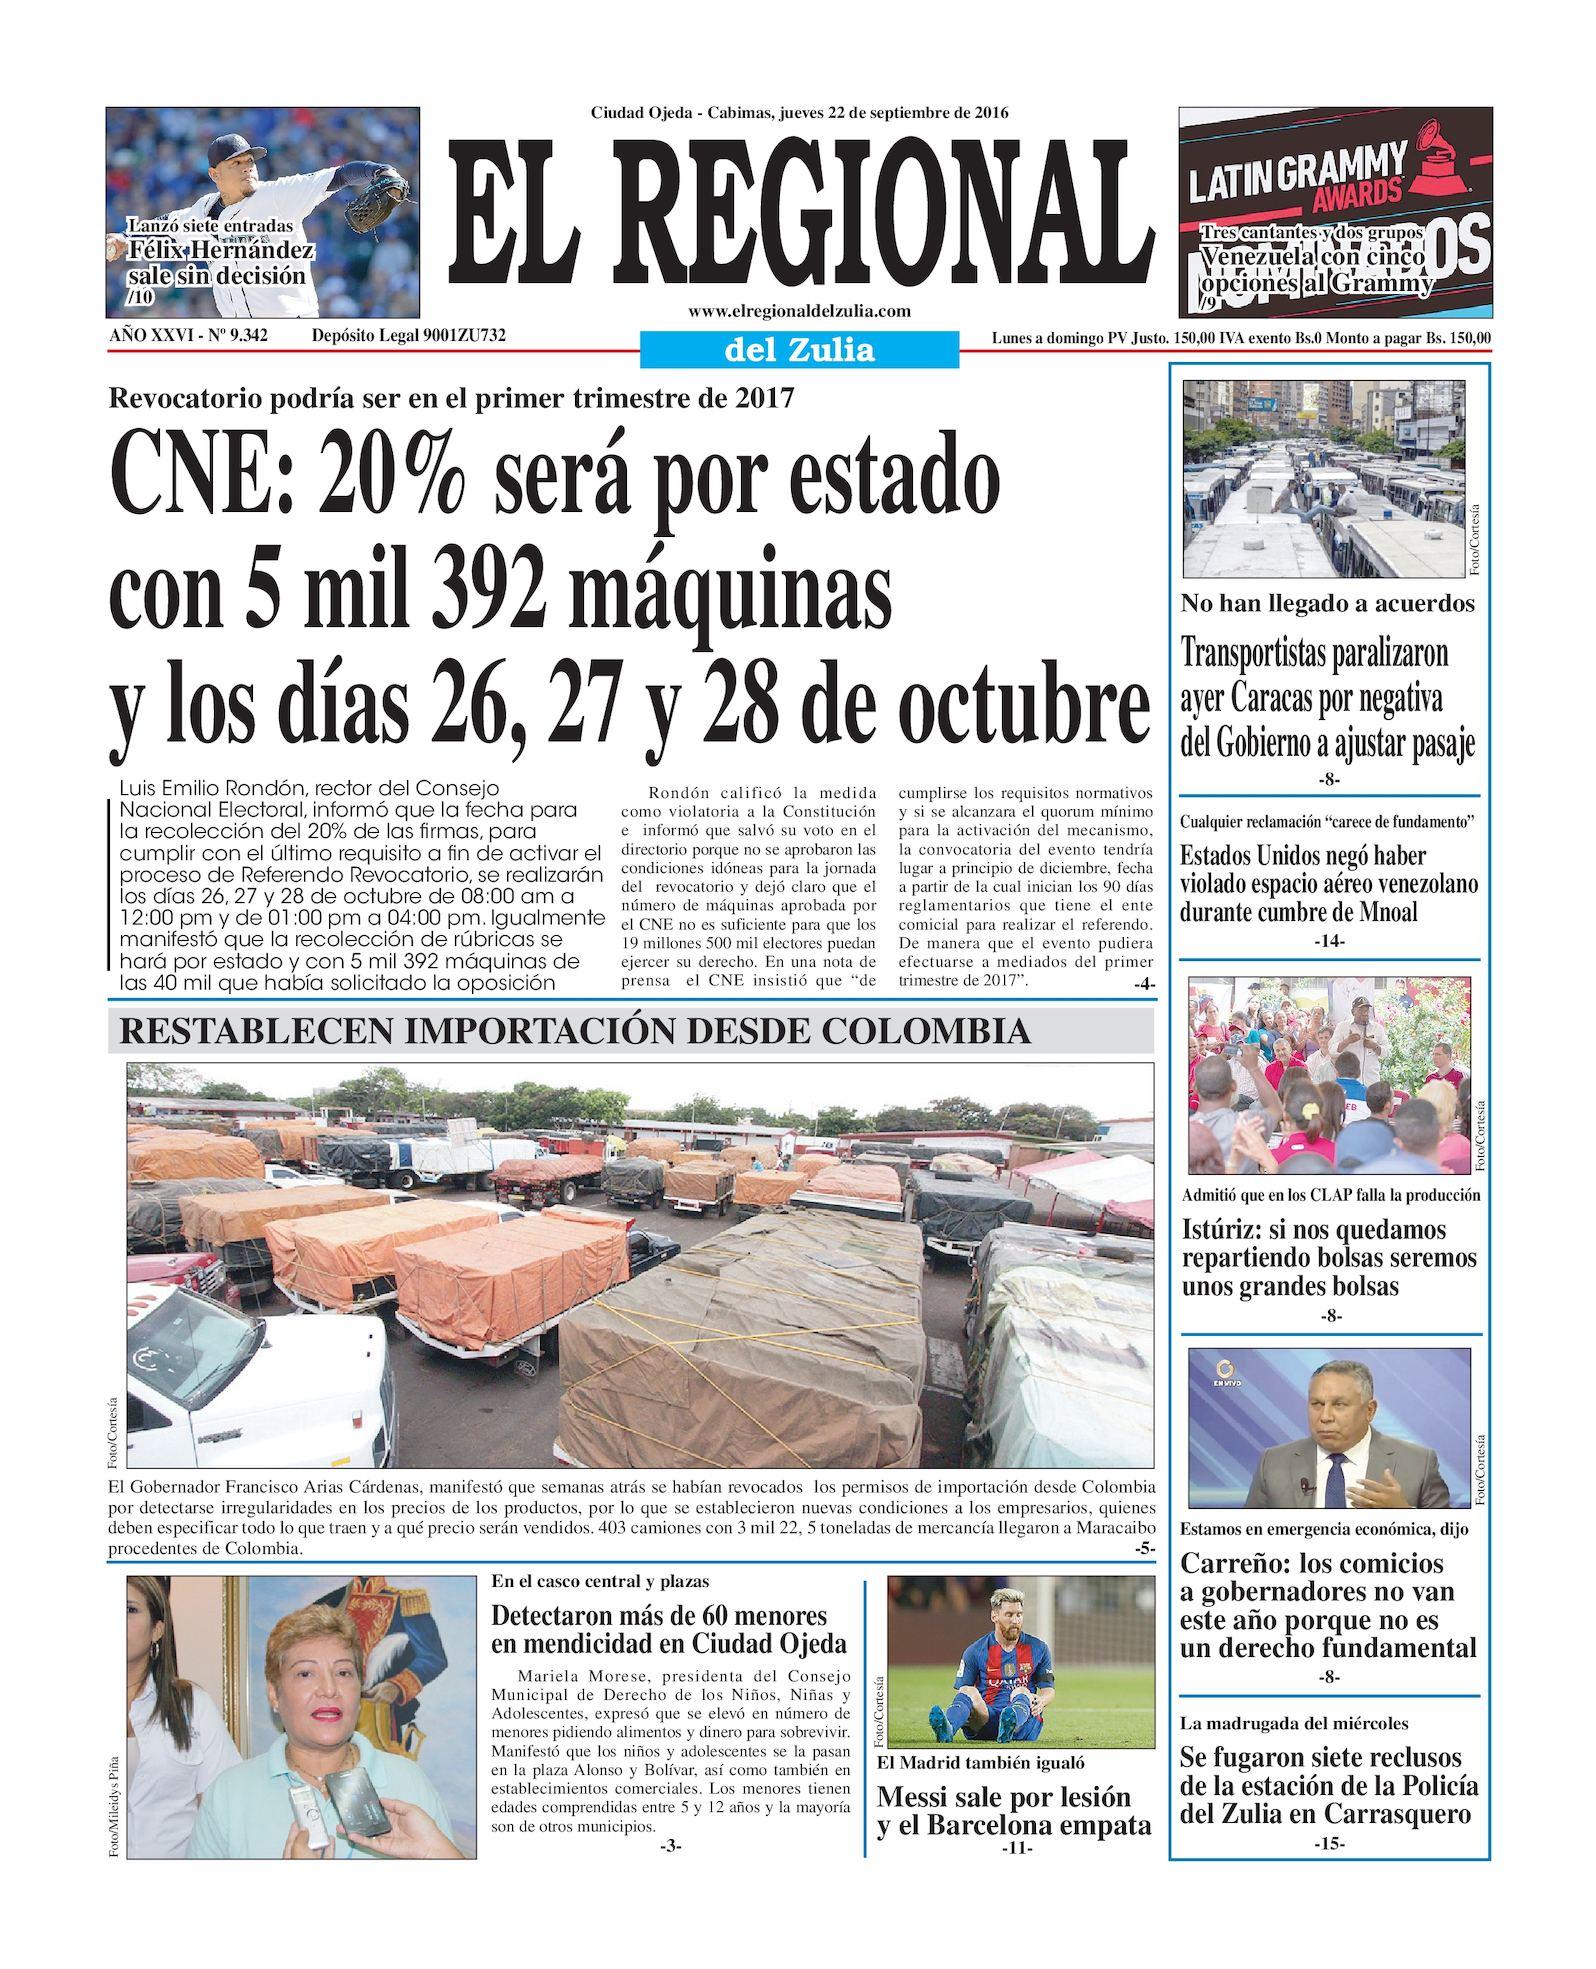 Calaméo - El Regional del Zulia 22-09-2016